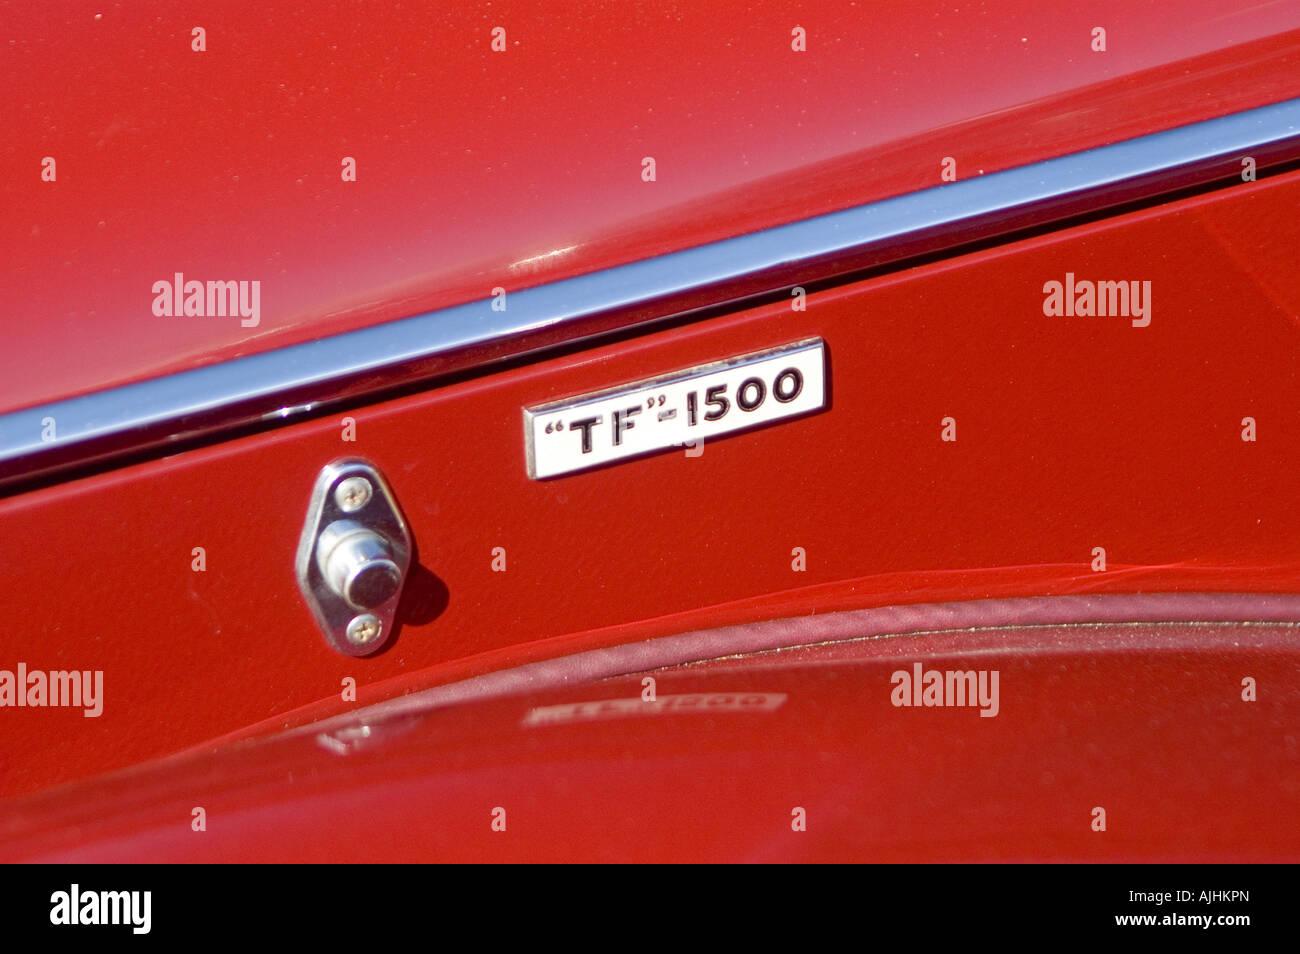 MG TF 1500 vintage sports car detail badge - Stock Image